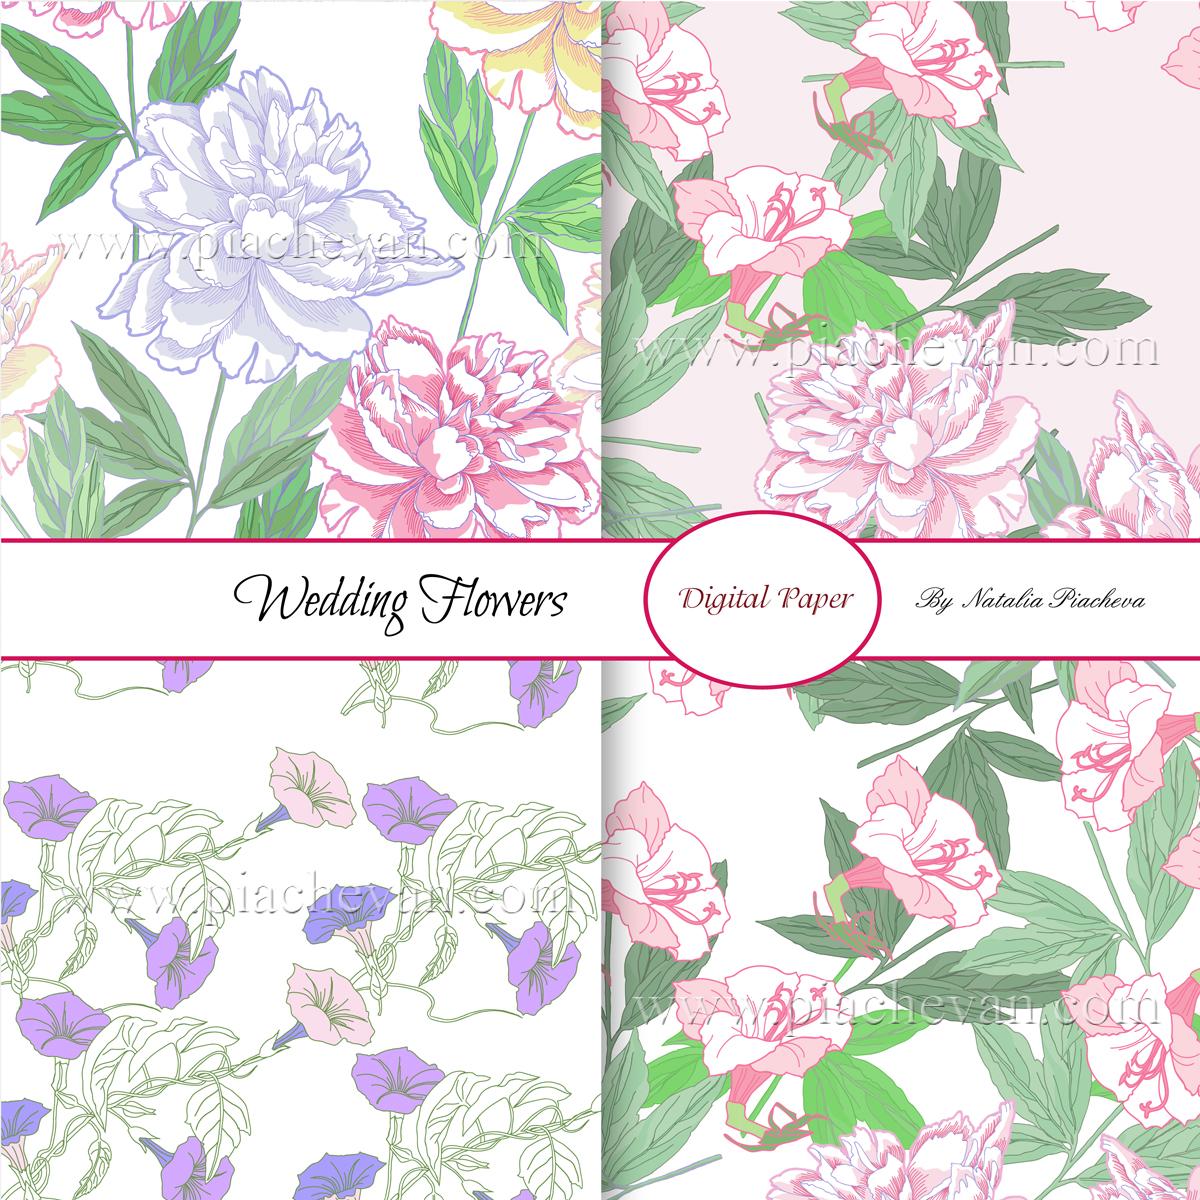 Wedding Flowers.Digital Paper example image 2